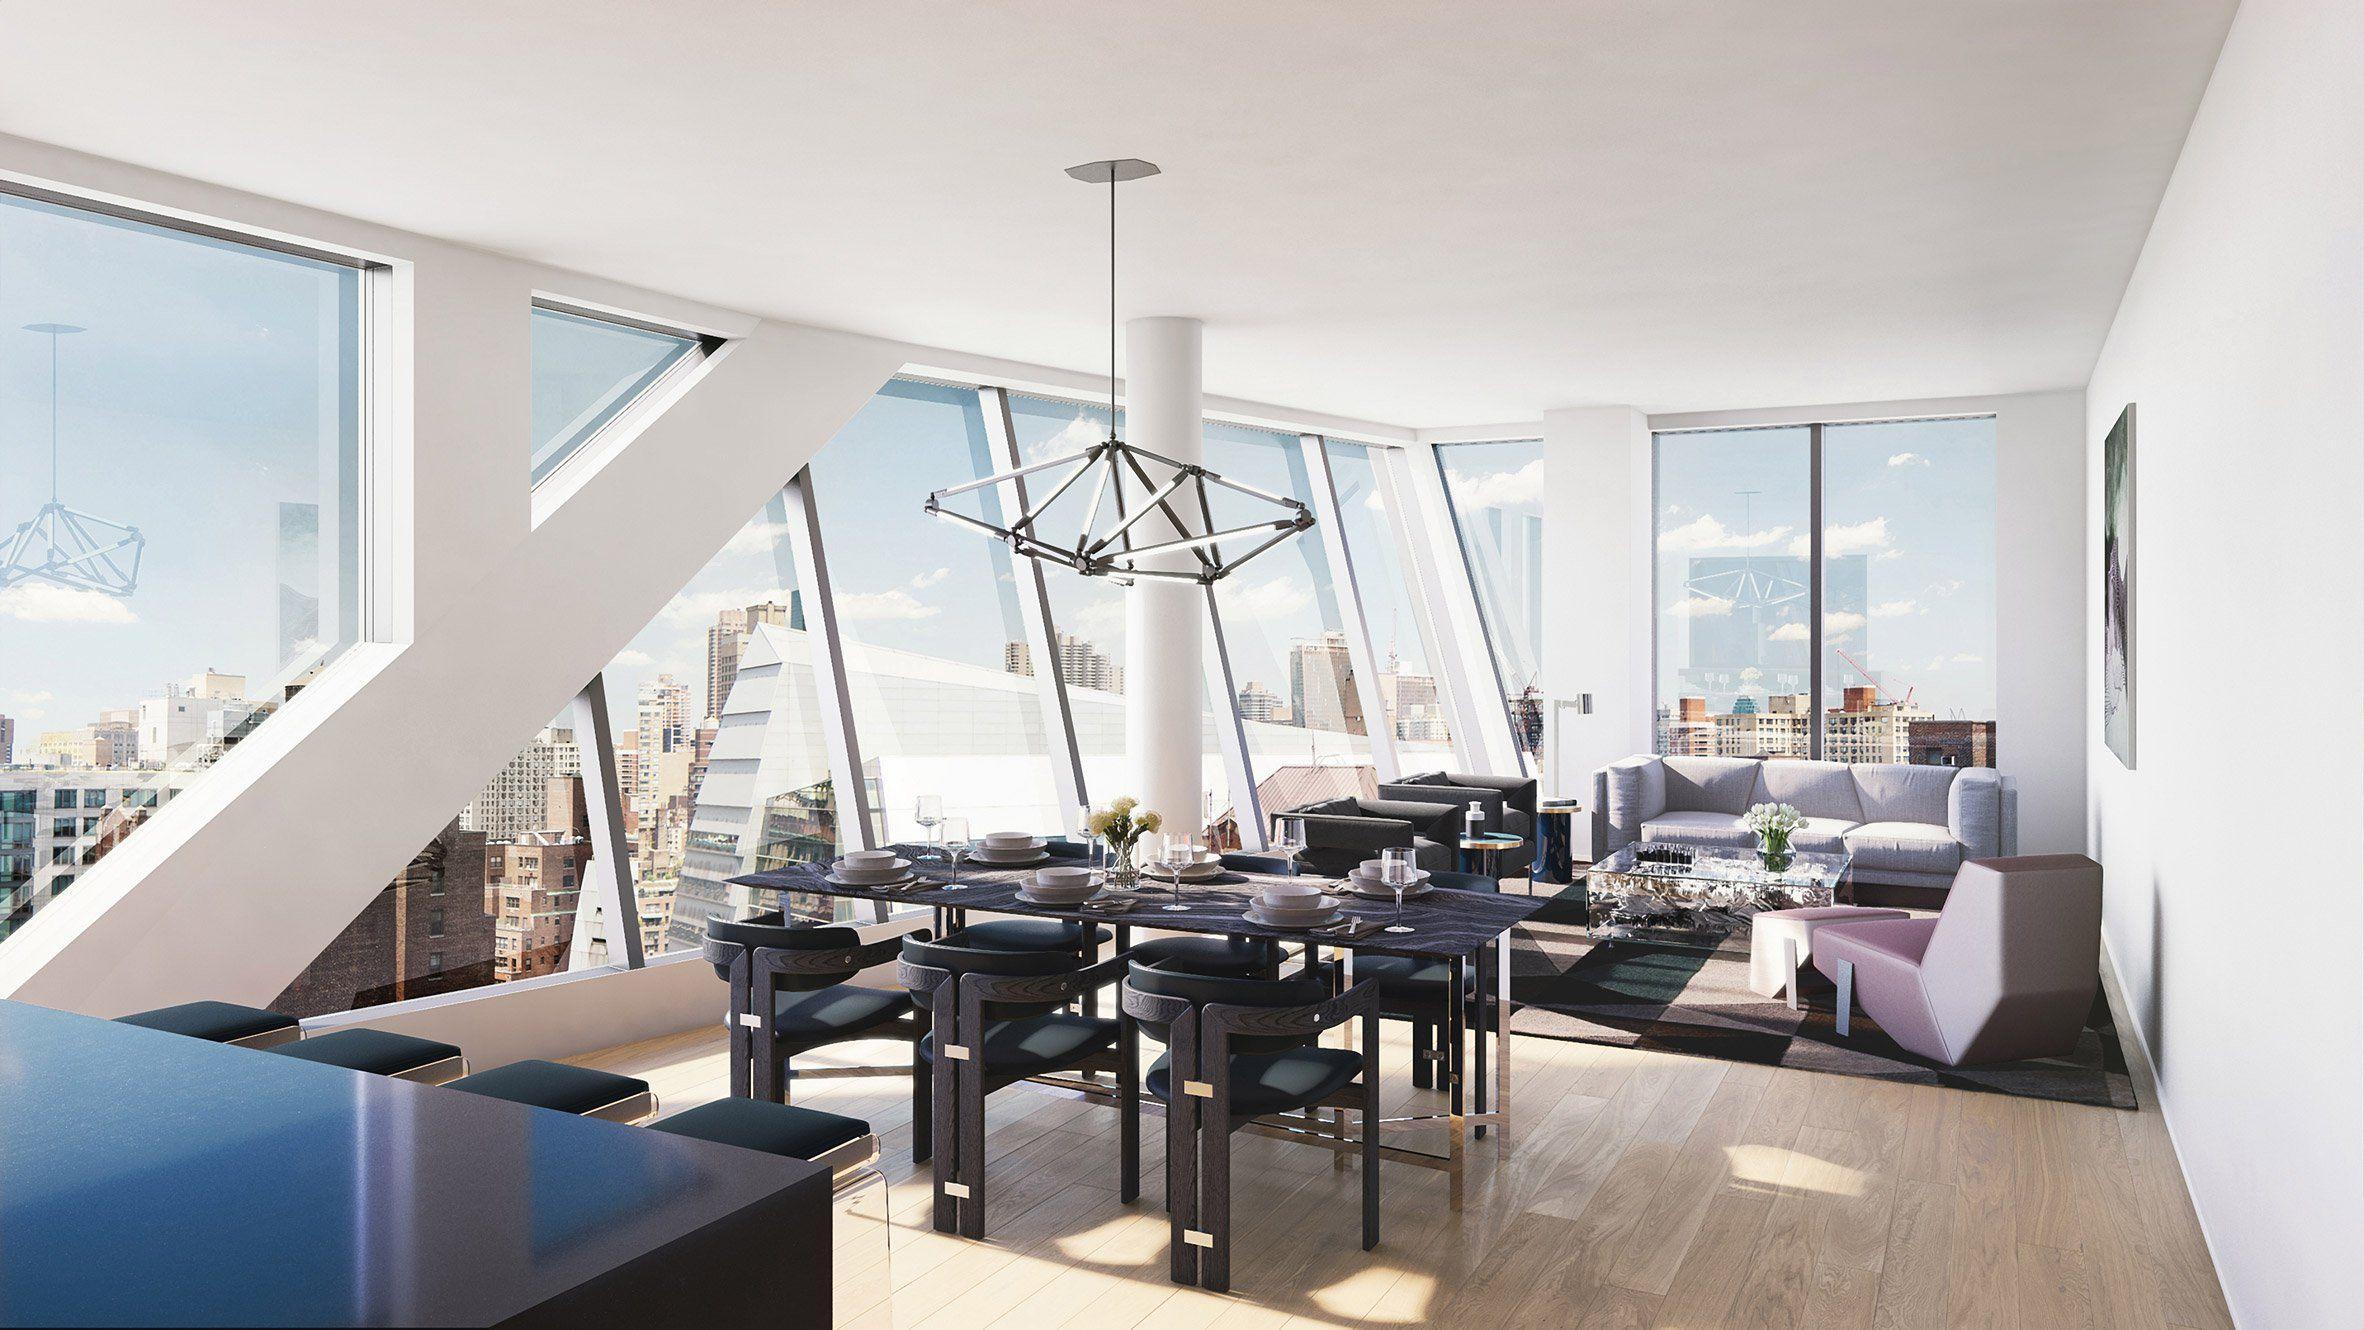 Rem Koolhaas has expressed his excitement at building in Manhattan